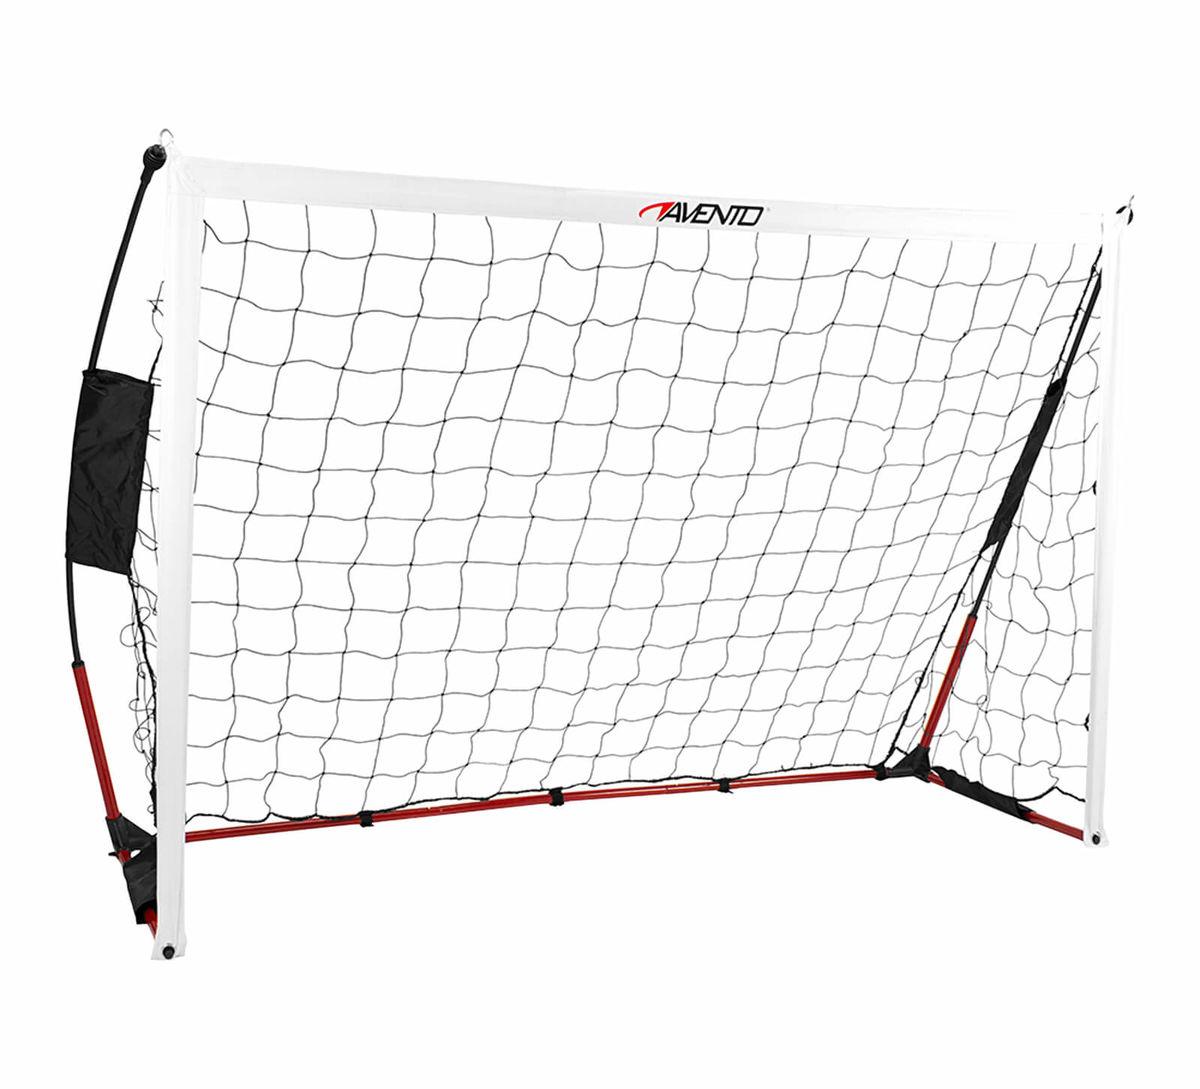 Image of Avento 180x120cm Fussball Goal